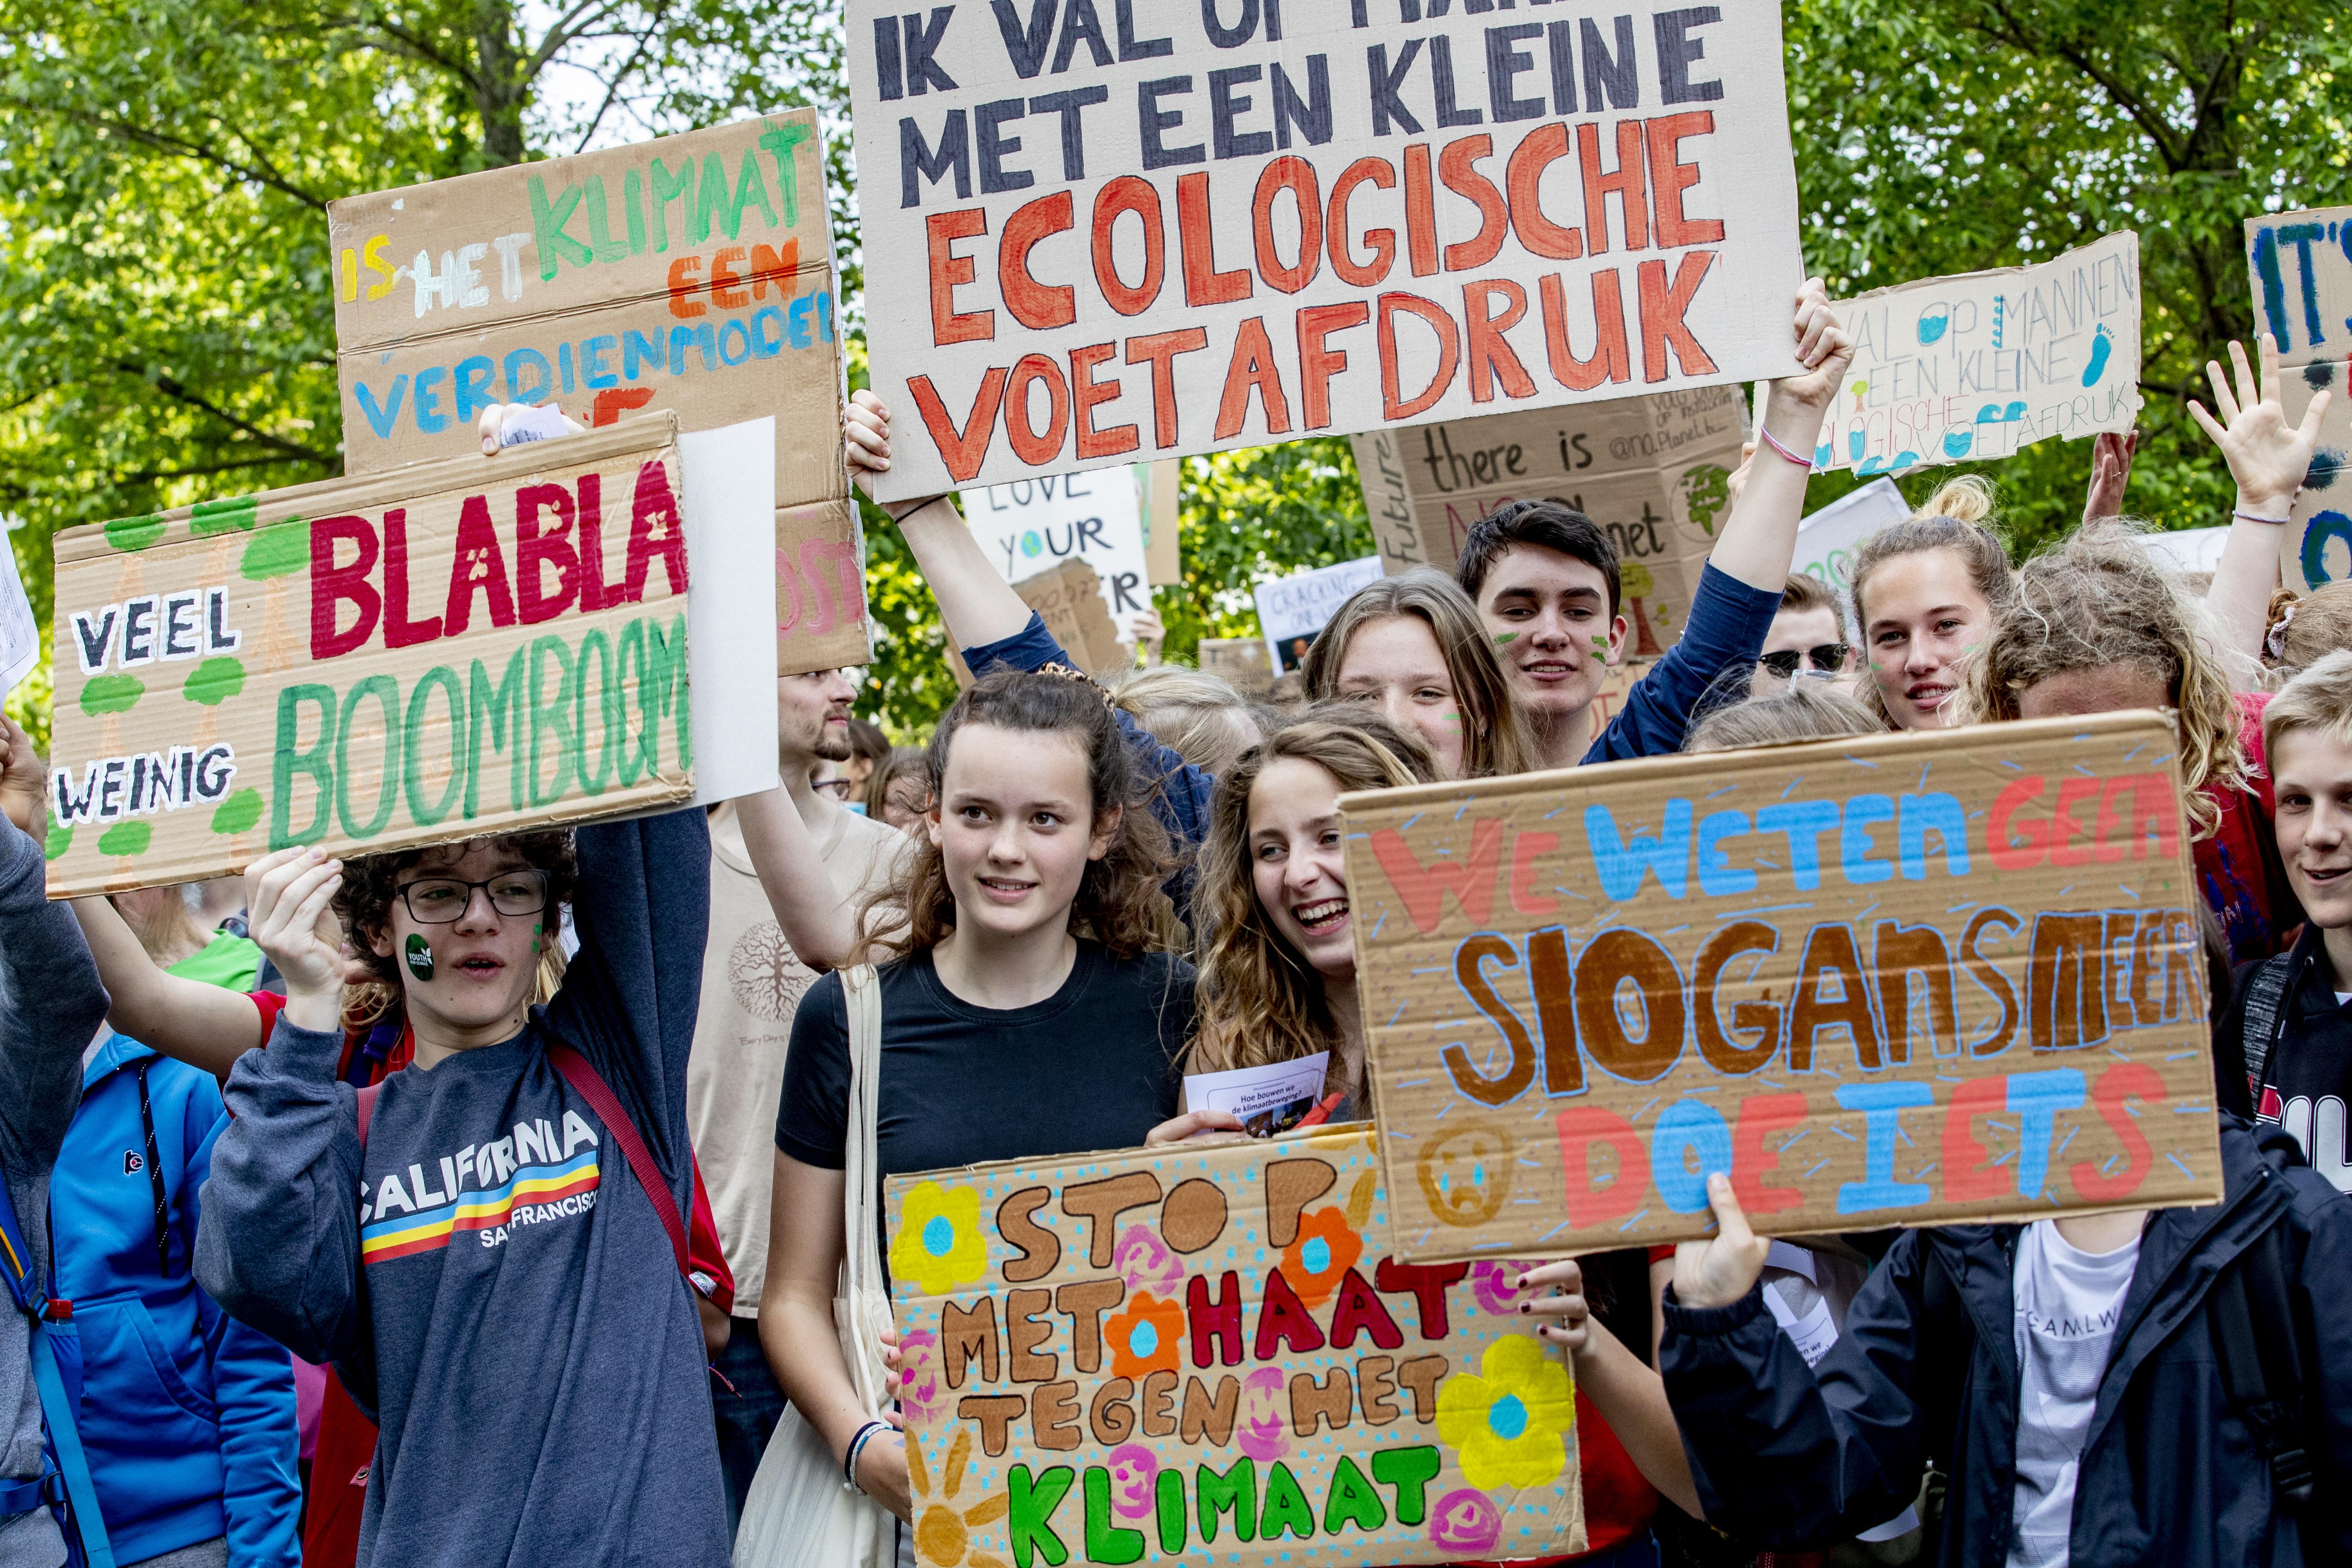 klimaatprotest